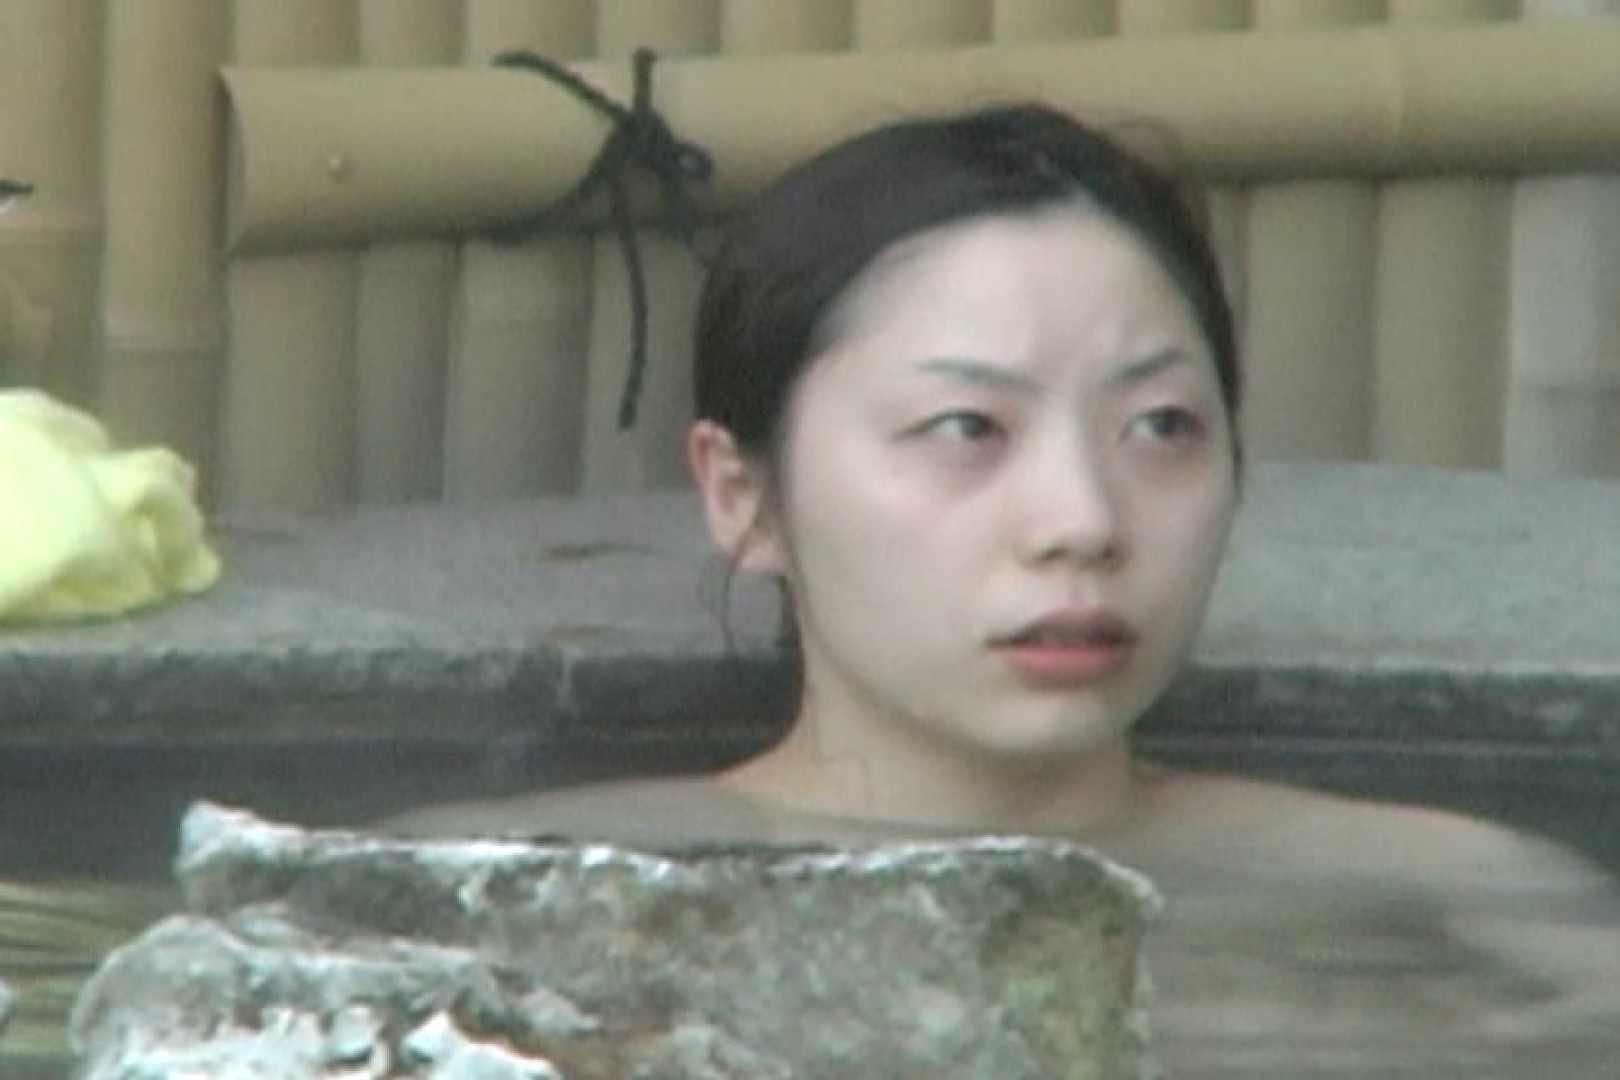 Aquaな露天風呂Vol.596 露天 覗きおまんこ画像 77画像 2